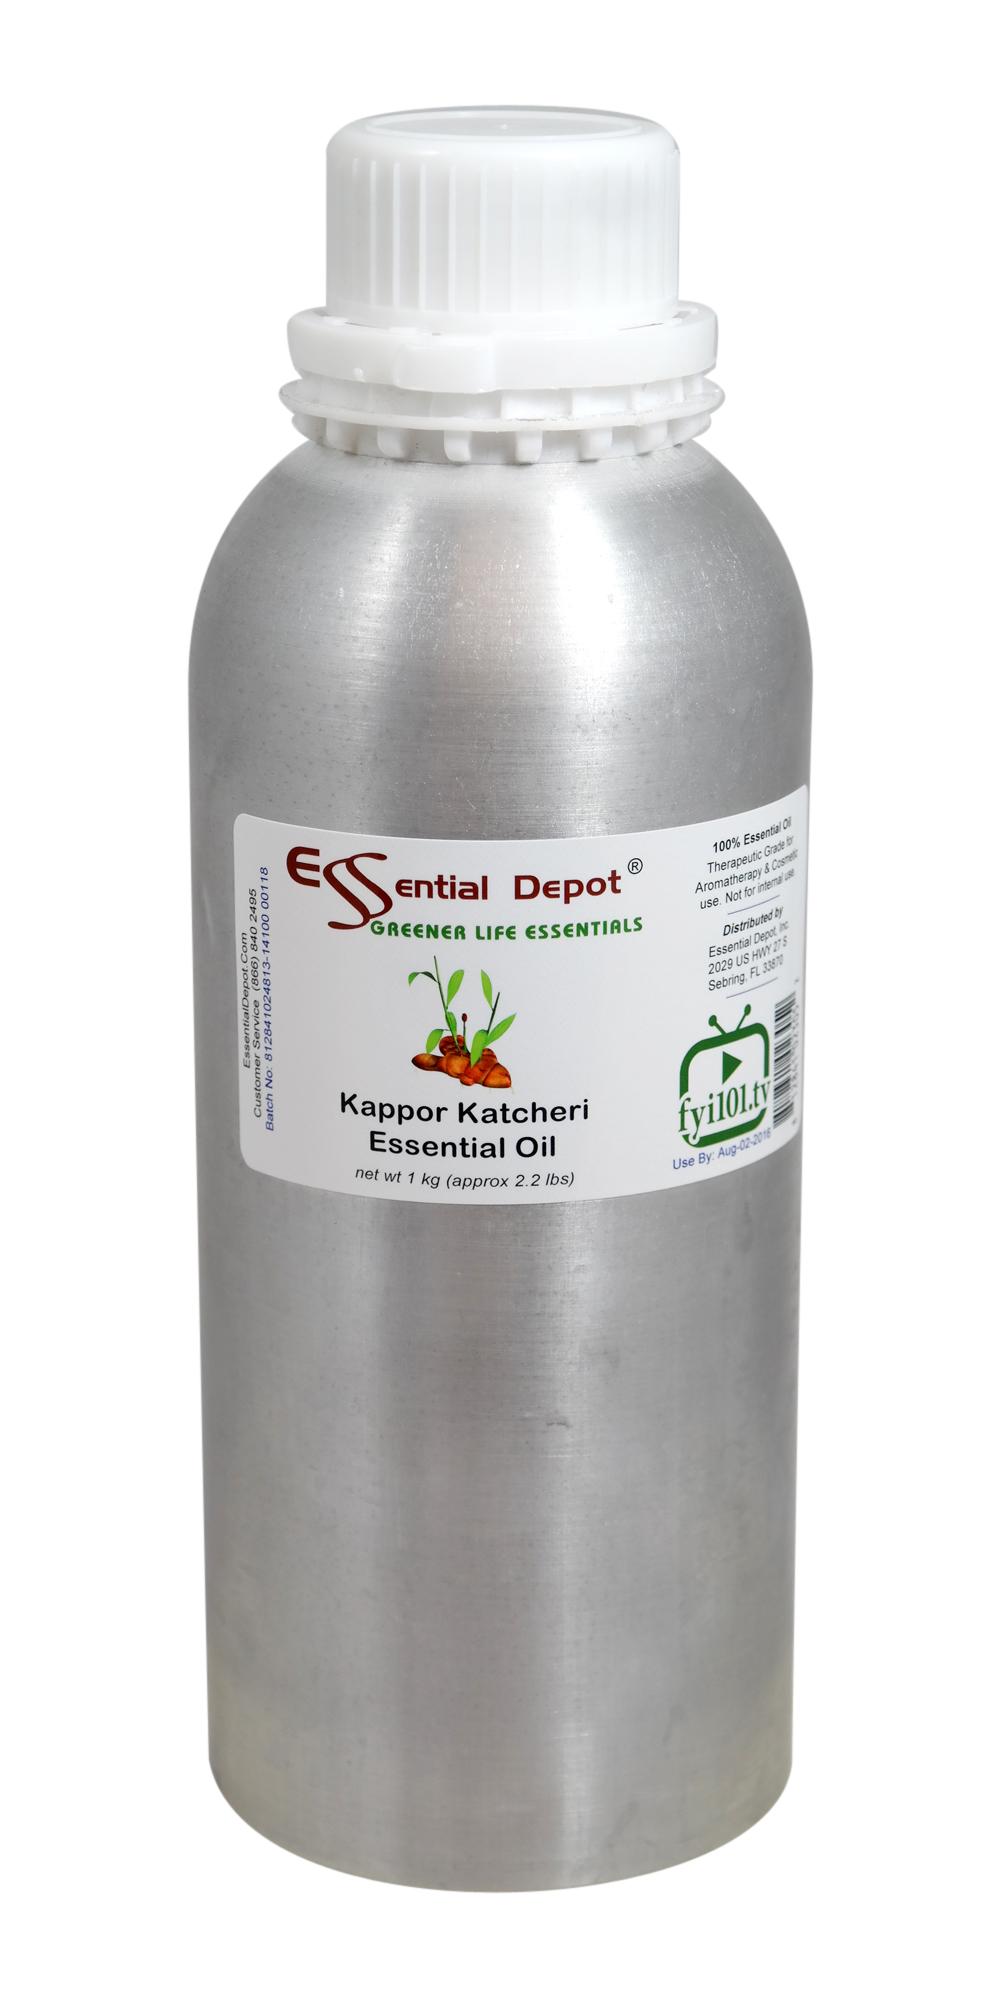 Kappor katcheri Essential Oil - 1 kg. - Approx 2.2 lbs. - FREE US SHIPPING